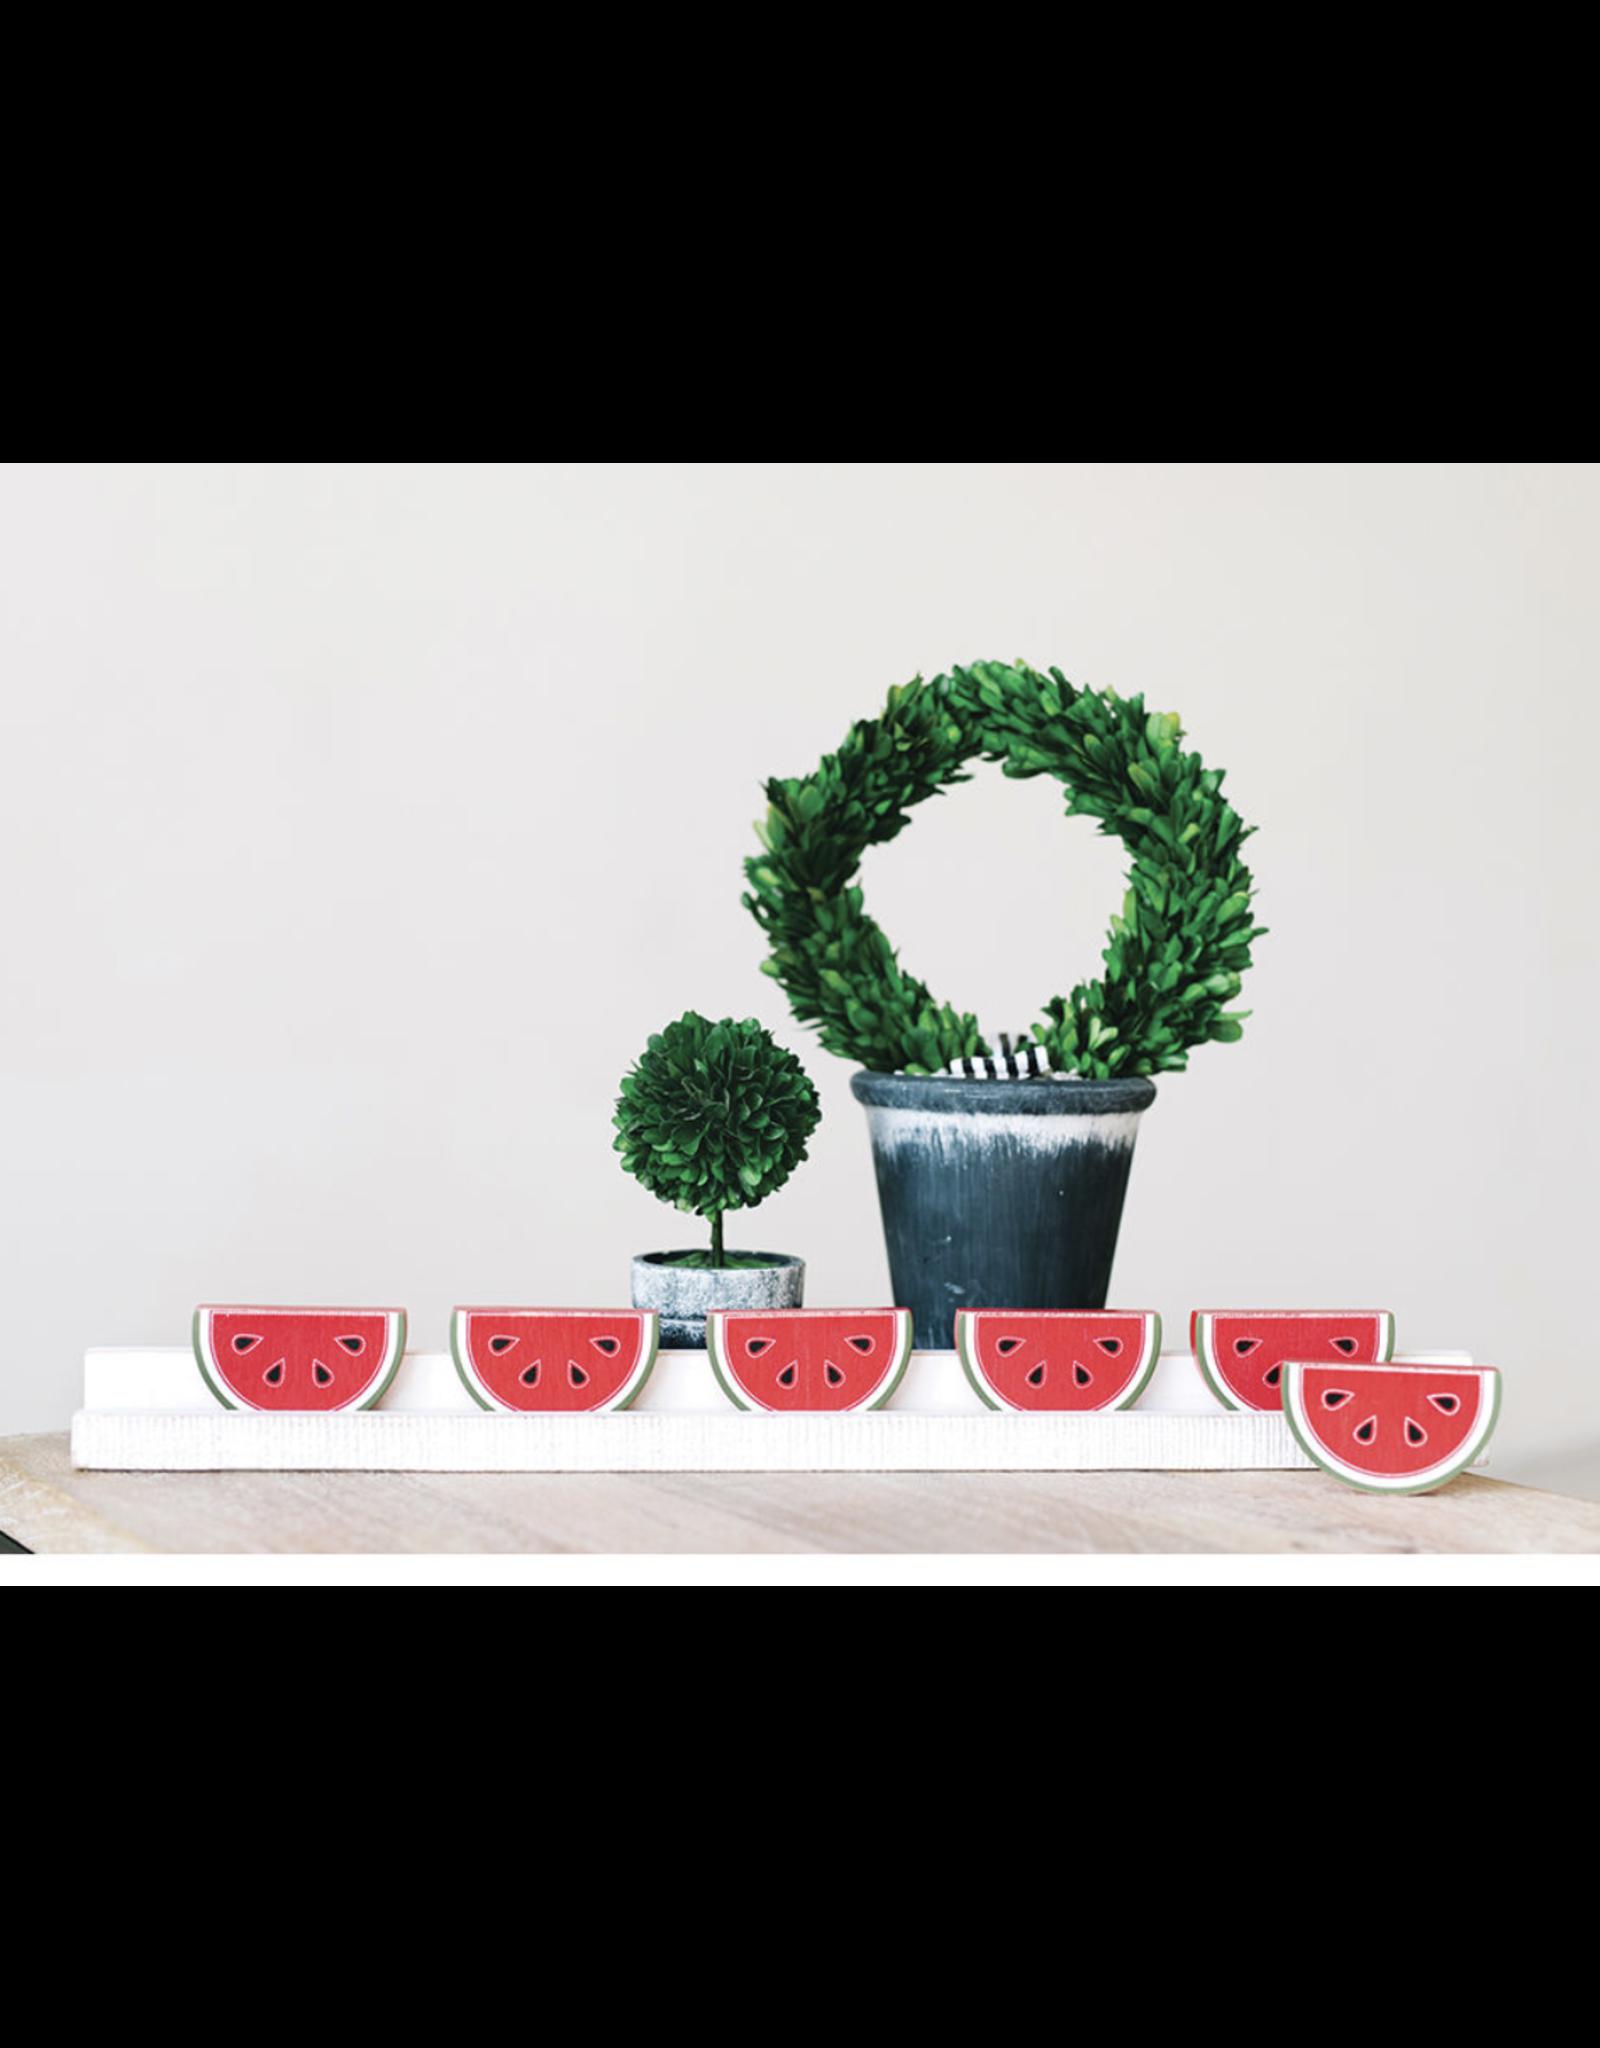 Adams & Co. Watermelon Tiles